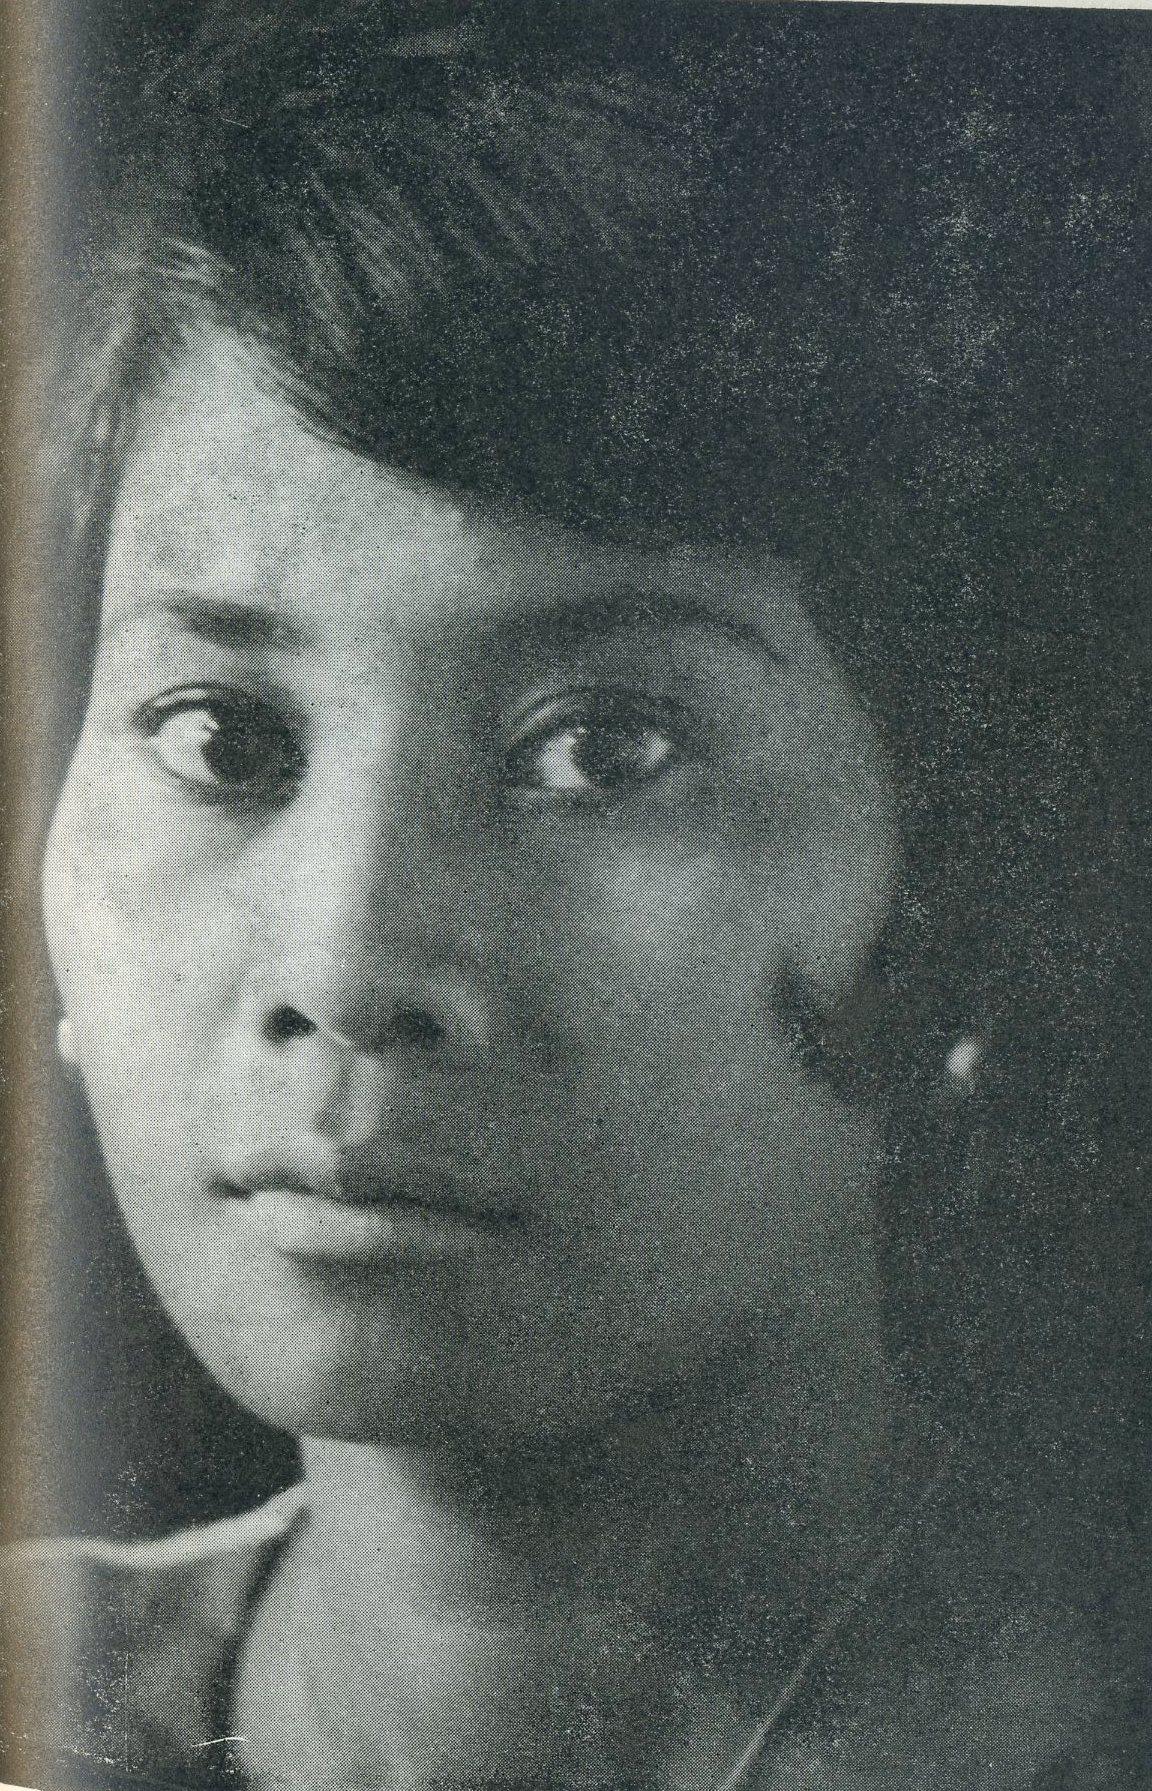 Liliane Nouh Chaia-Issa – Gré Ploeg (boerinnenkostuum, de moeder van Diana Dubois) – Tine Slager (kotomissie) - no6